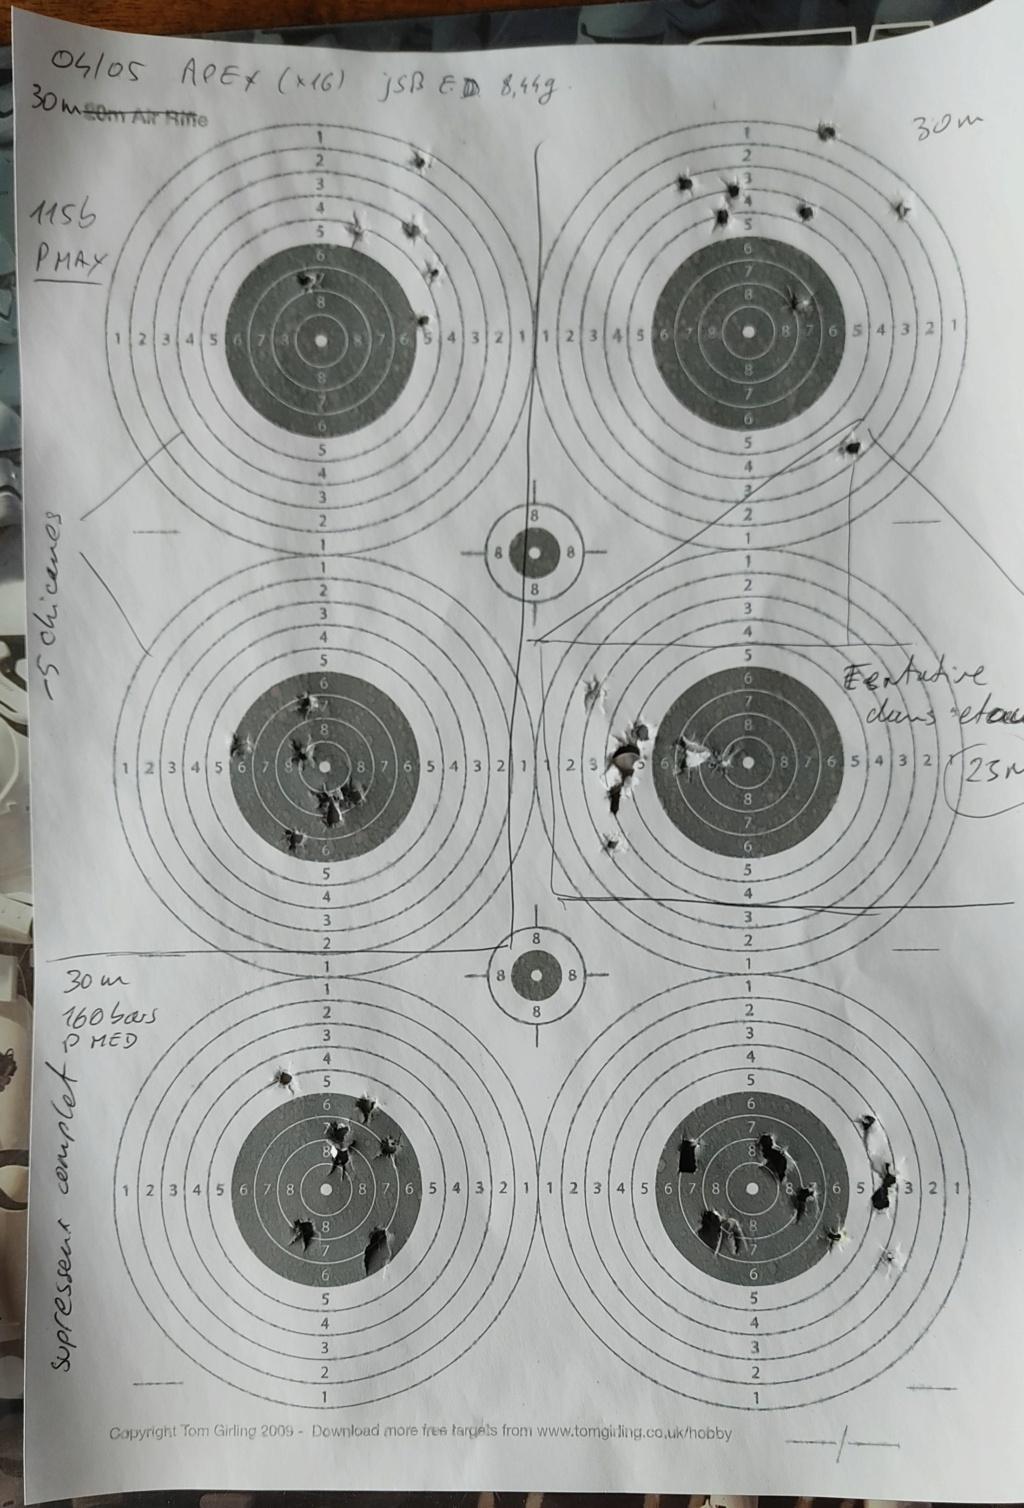 La REXIMEX APEX - 4,5mm, 19,9 Joules - Page 5 Img_2068